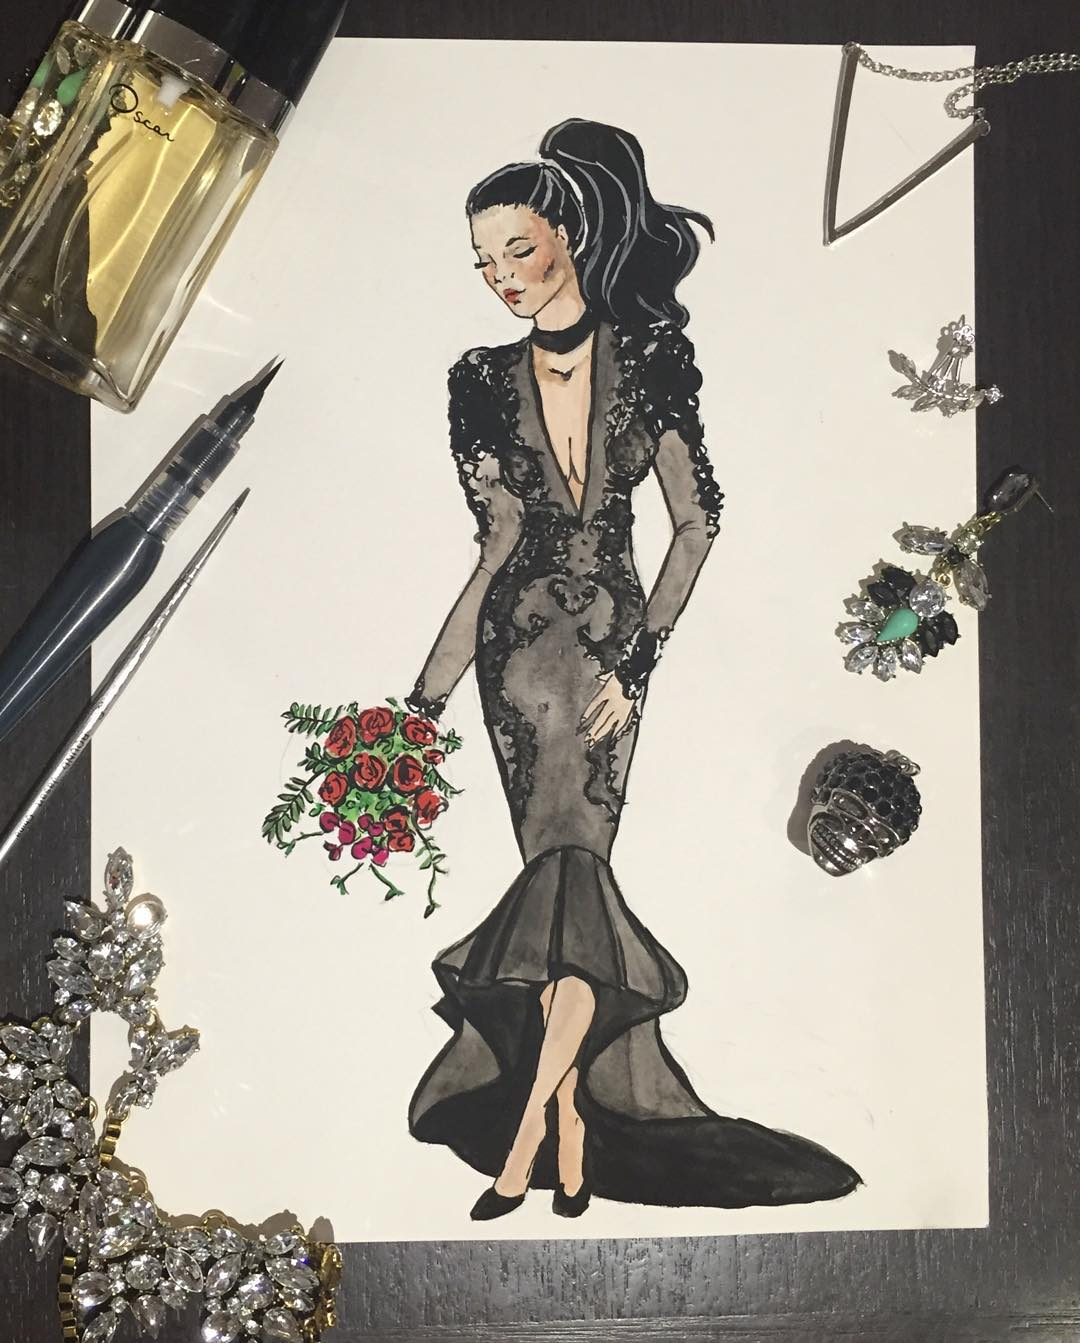 black-wedding-dress-sophie-cachia-anthony-montesano-signor-mont-couture-95